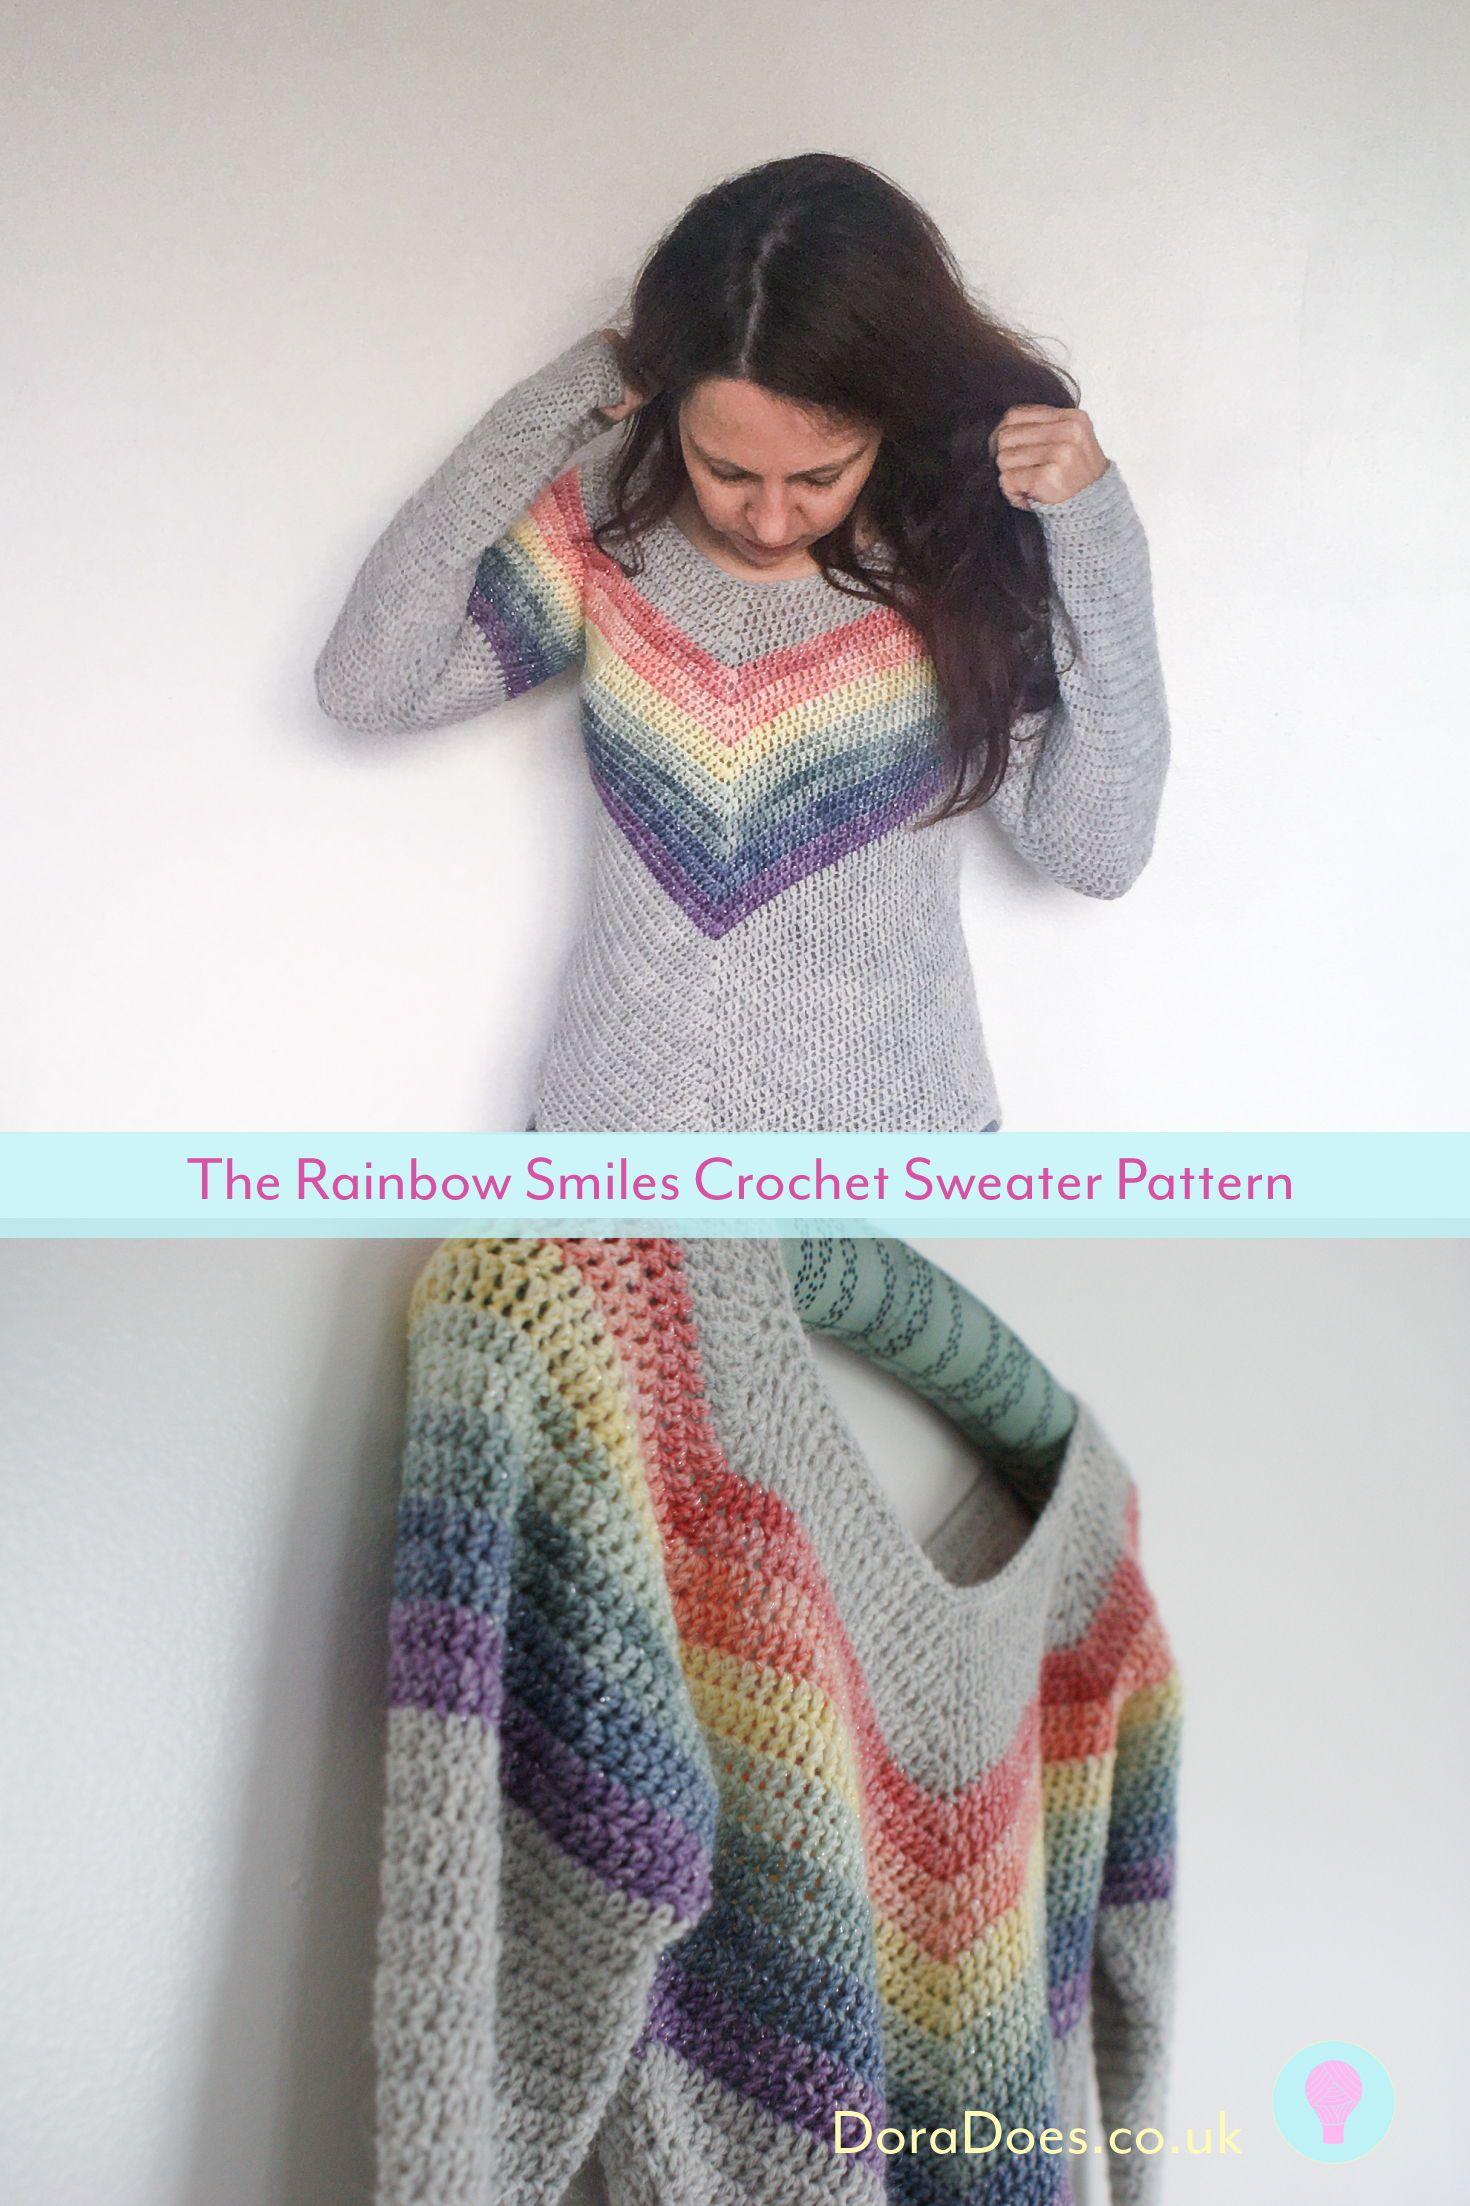 Rainbow Smiles Crochet Pattern Rainbow Smiles Crochet Pattern Woman Knitwear and Sweaters 3 square woman free knit sweater pattern